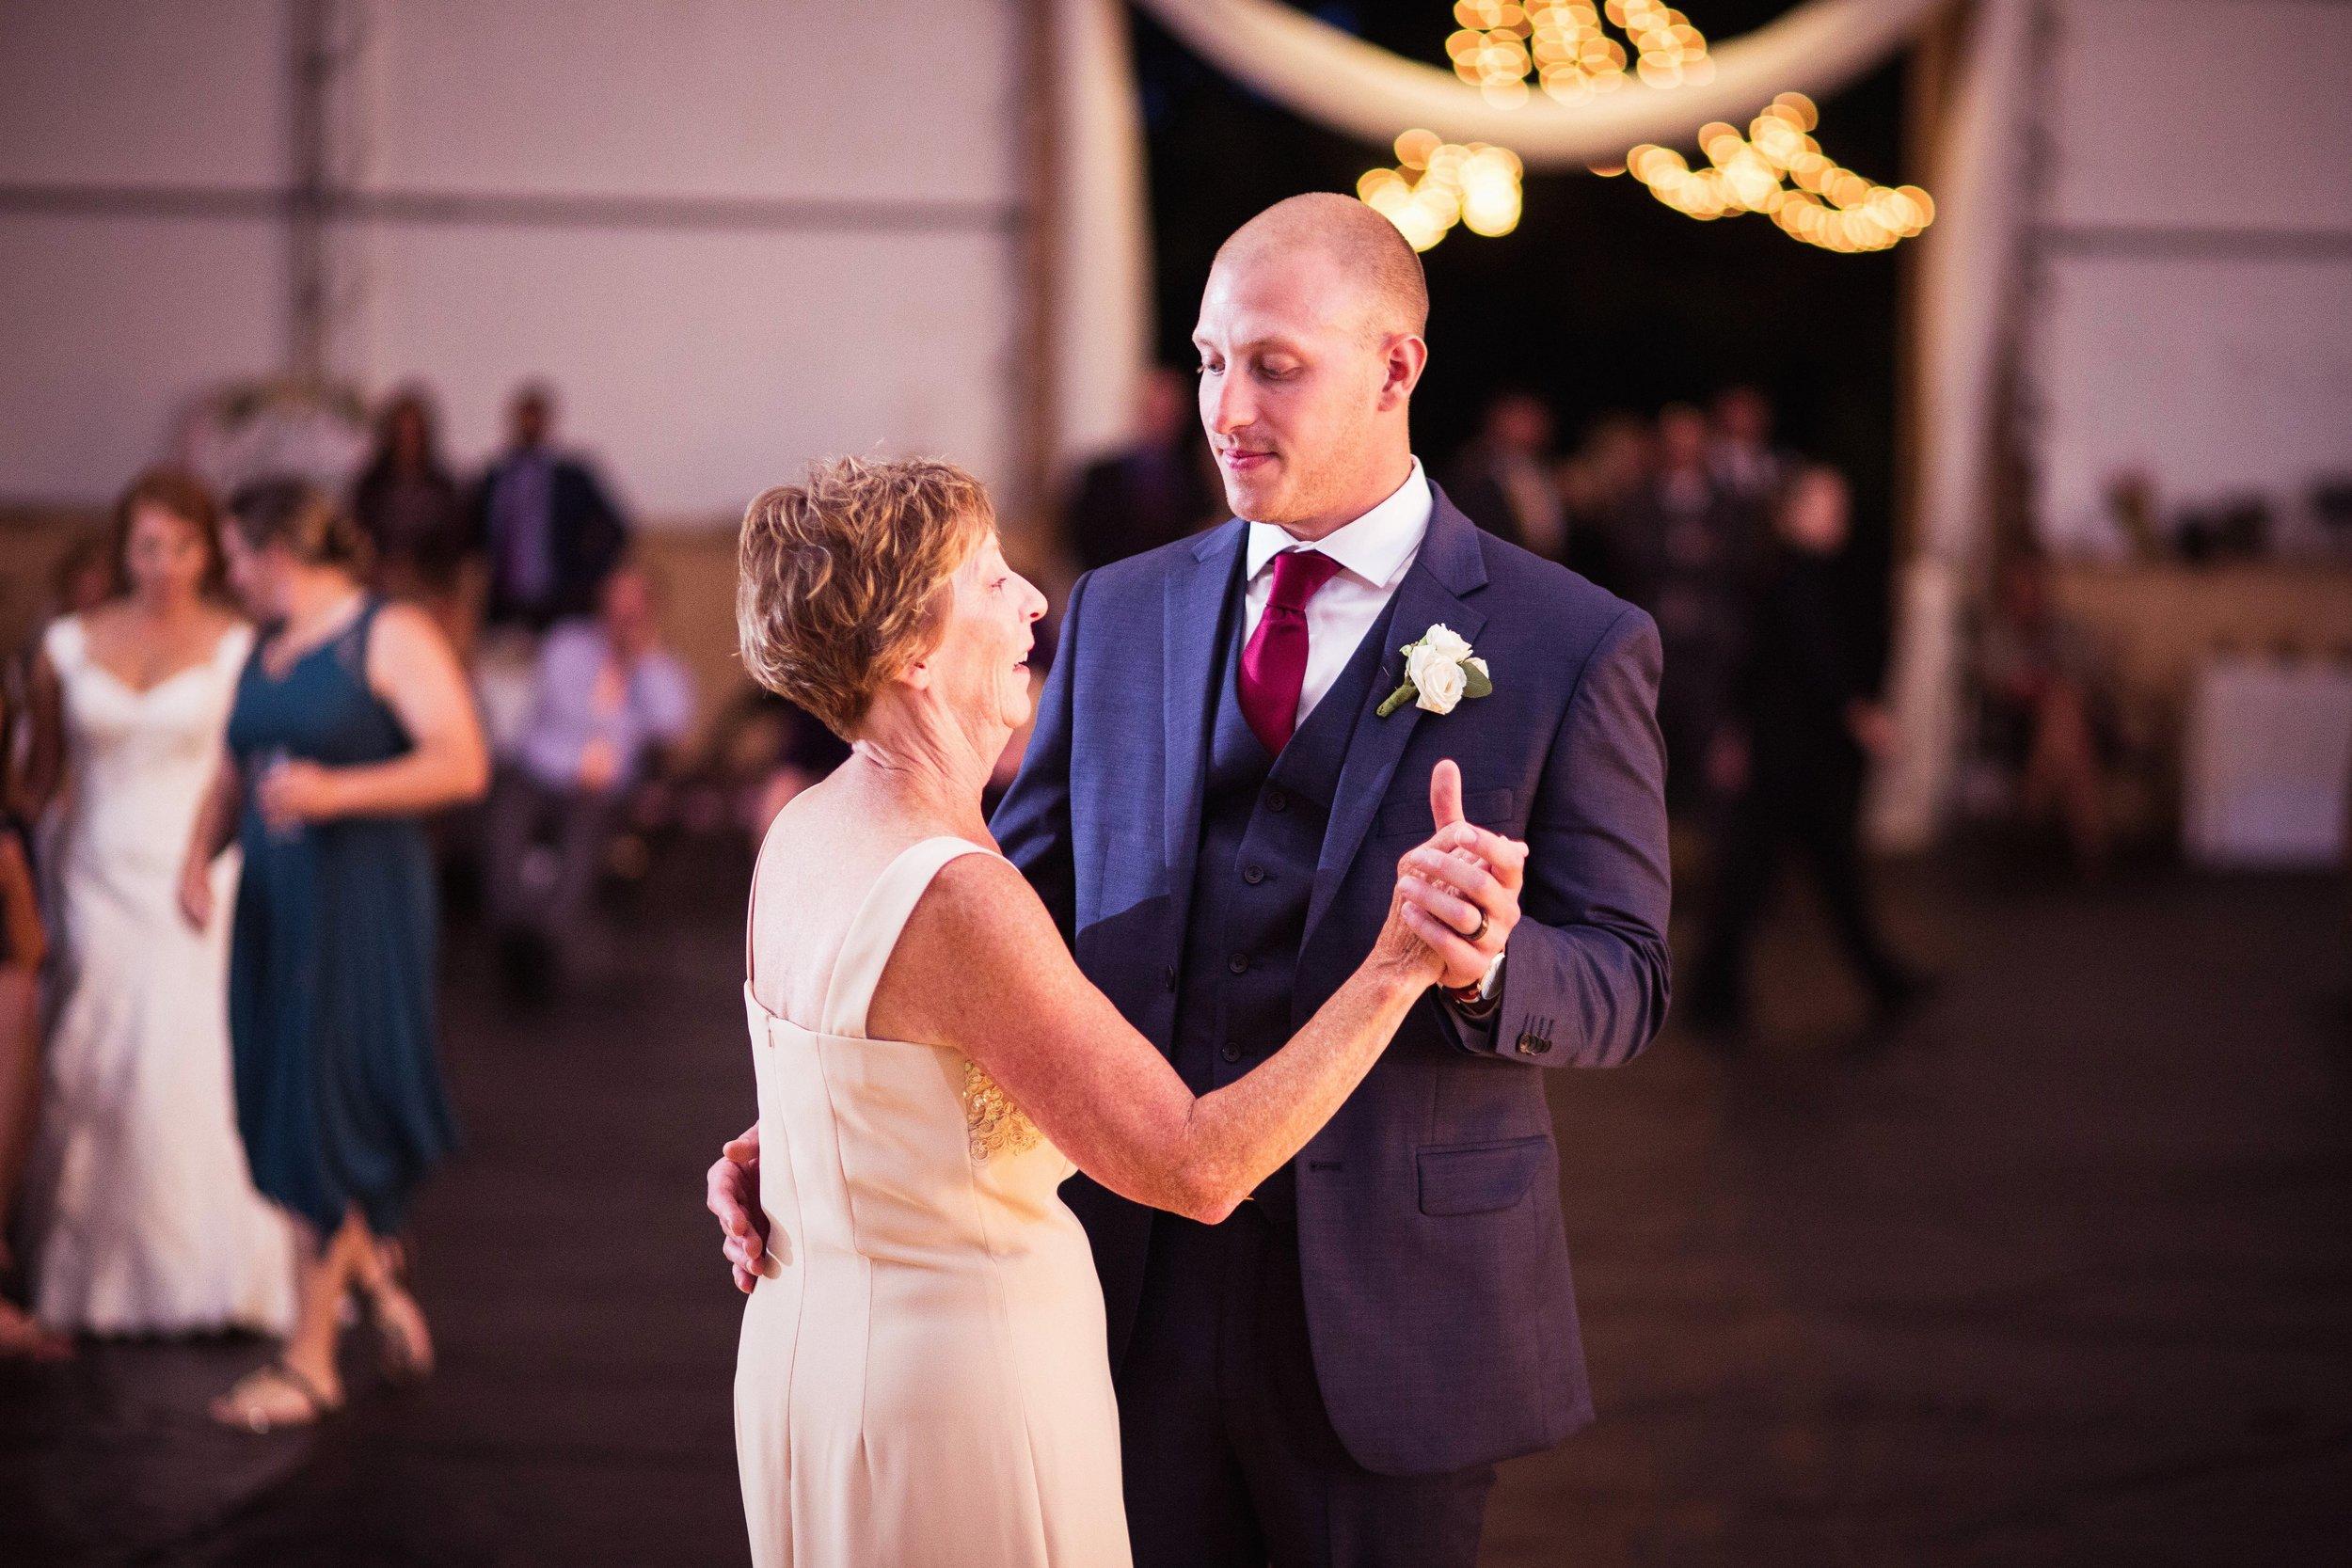 Blog-Lisa-James-Wedding-at Rosebud Estate Weddings in Arcade NY by Stefan-Ludwig-Photography-Buffalo-NY-73-x.jpg